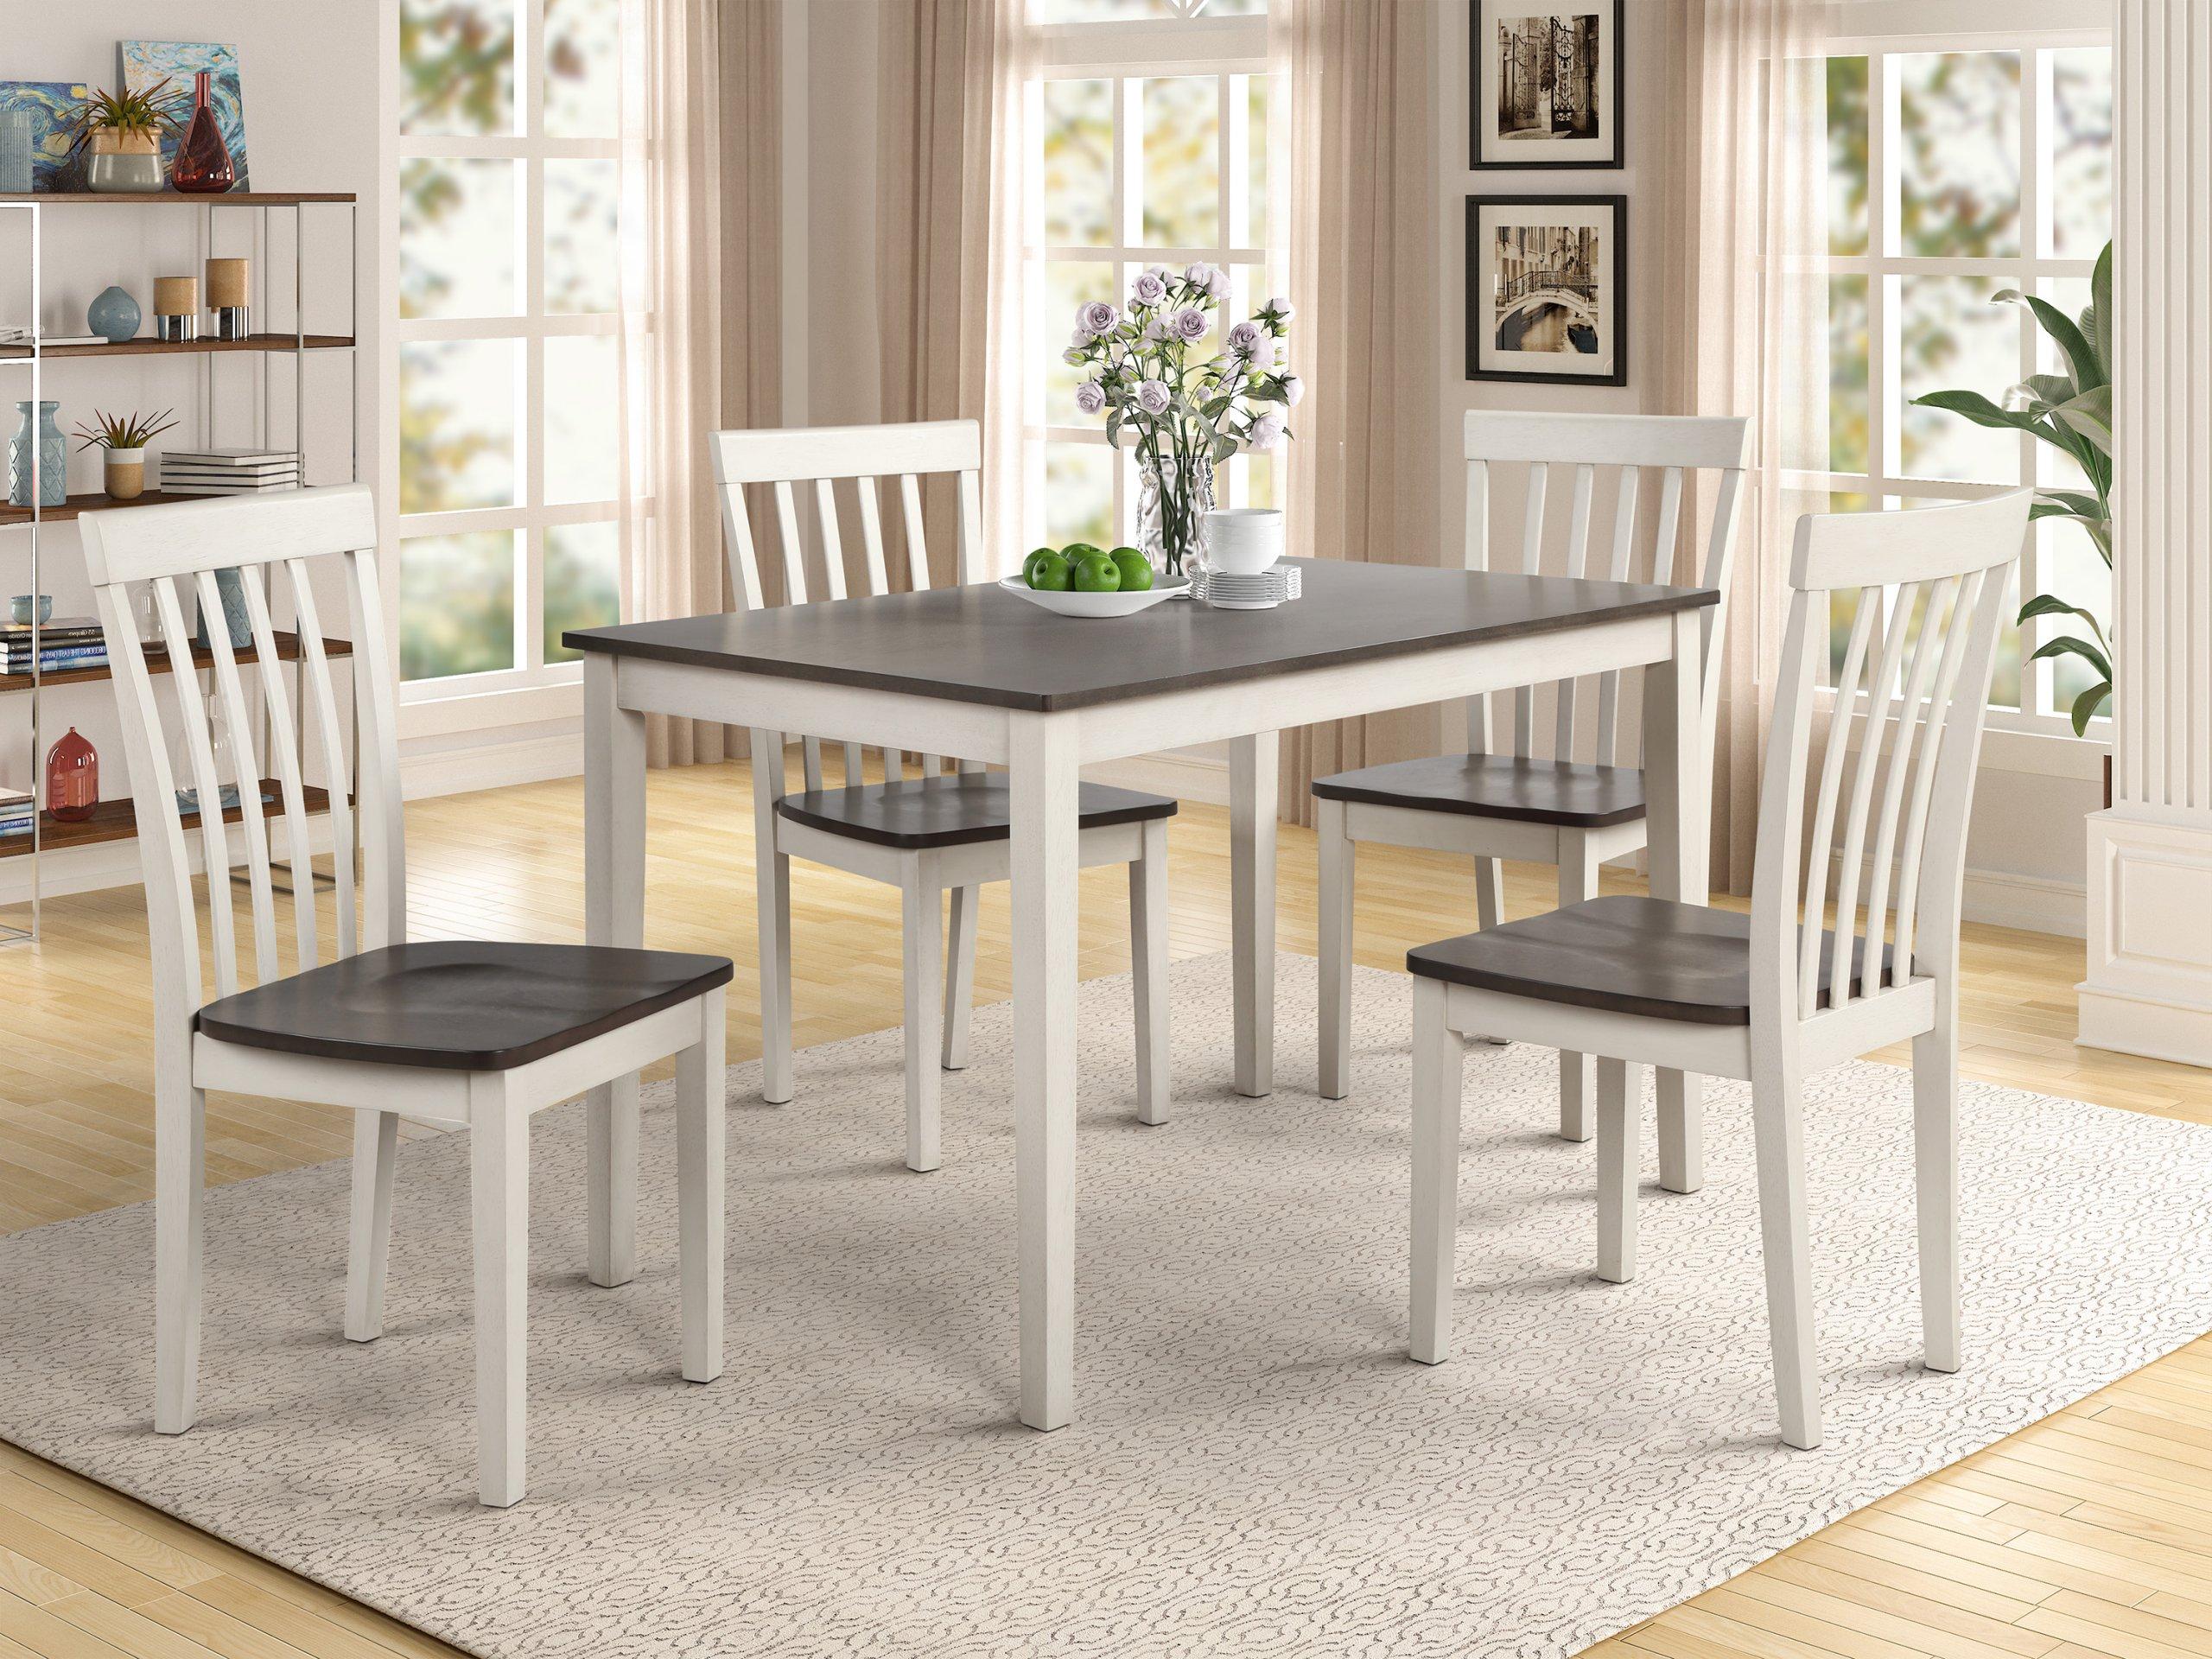 2182 Brody White/Grey Dining Room Set